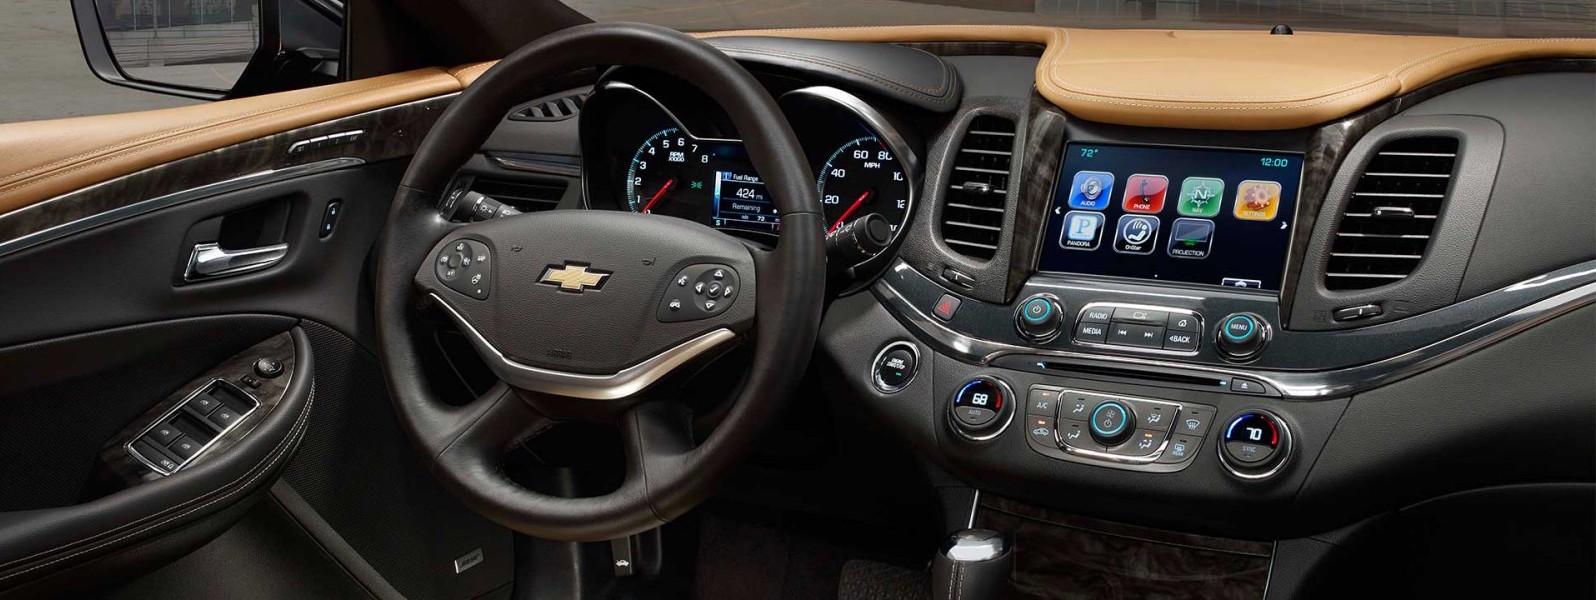 Chevy Impala Technology